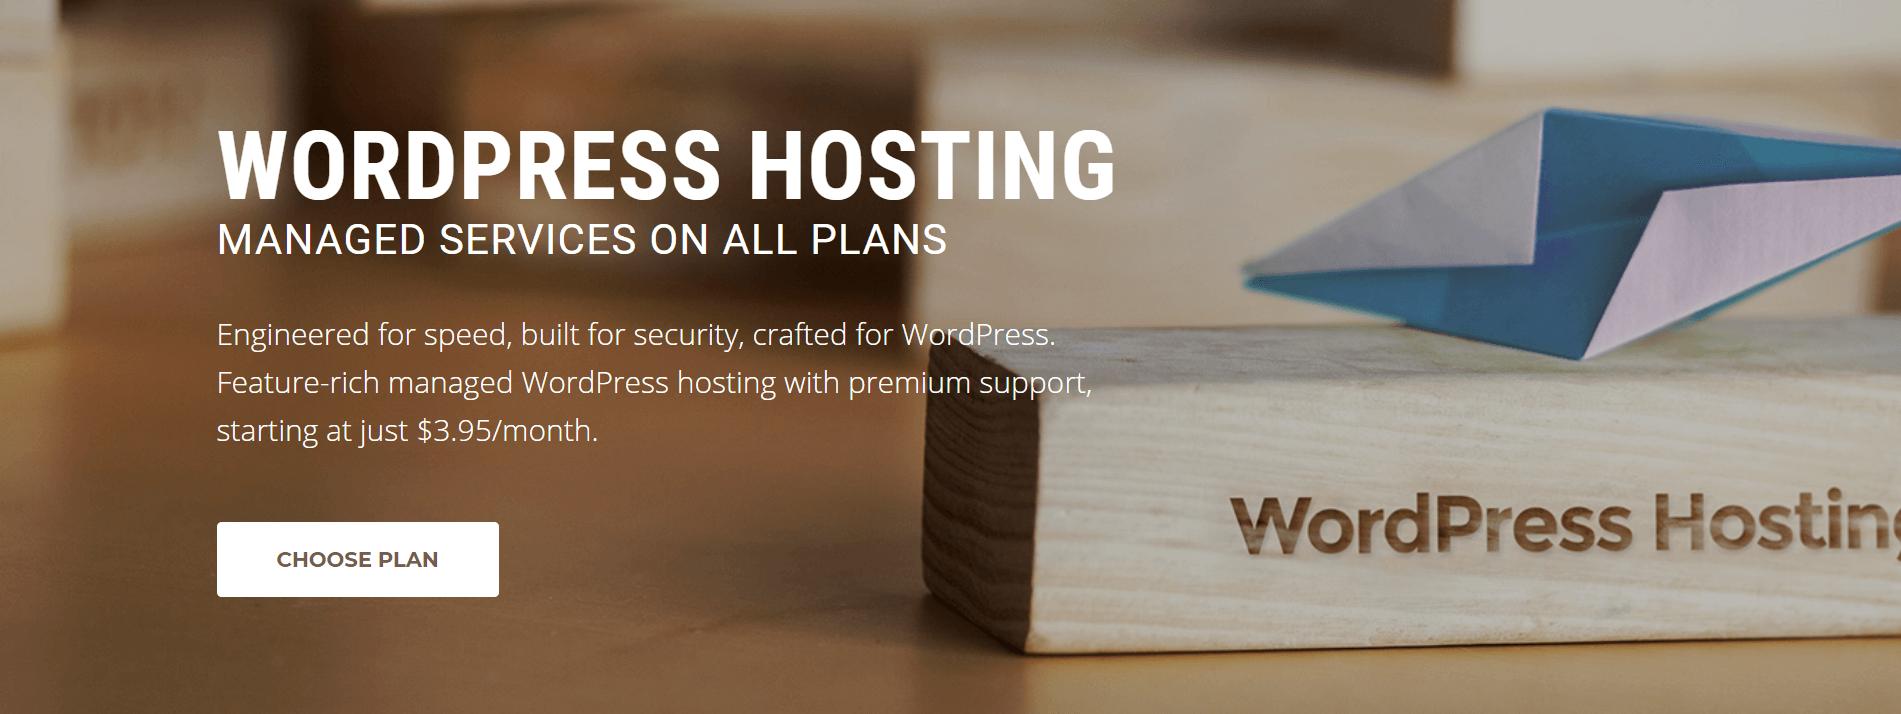 SiteGround WordPress hosting.